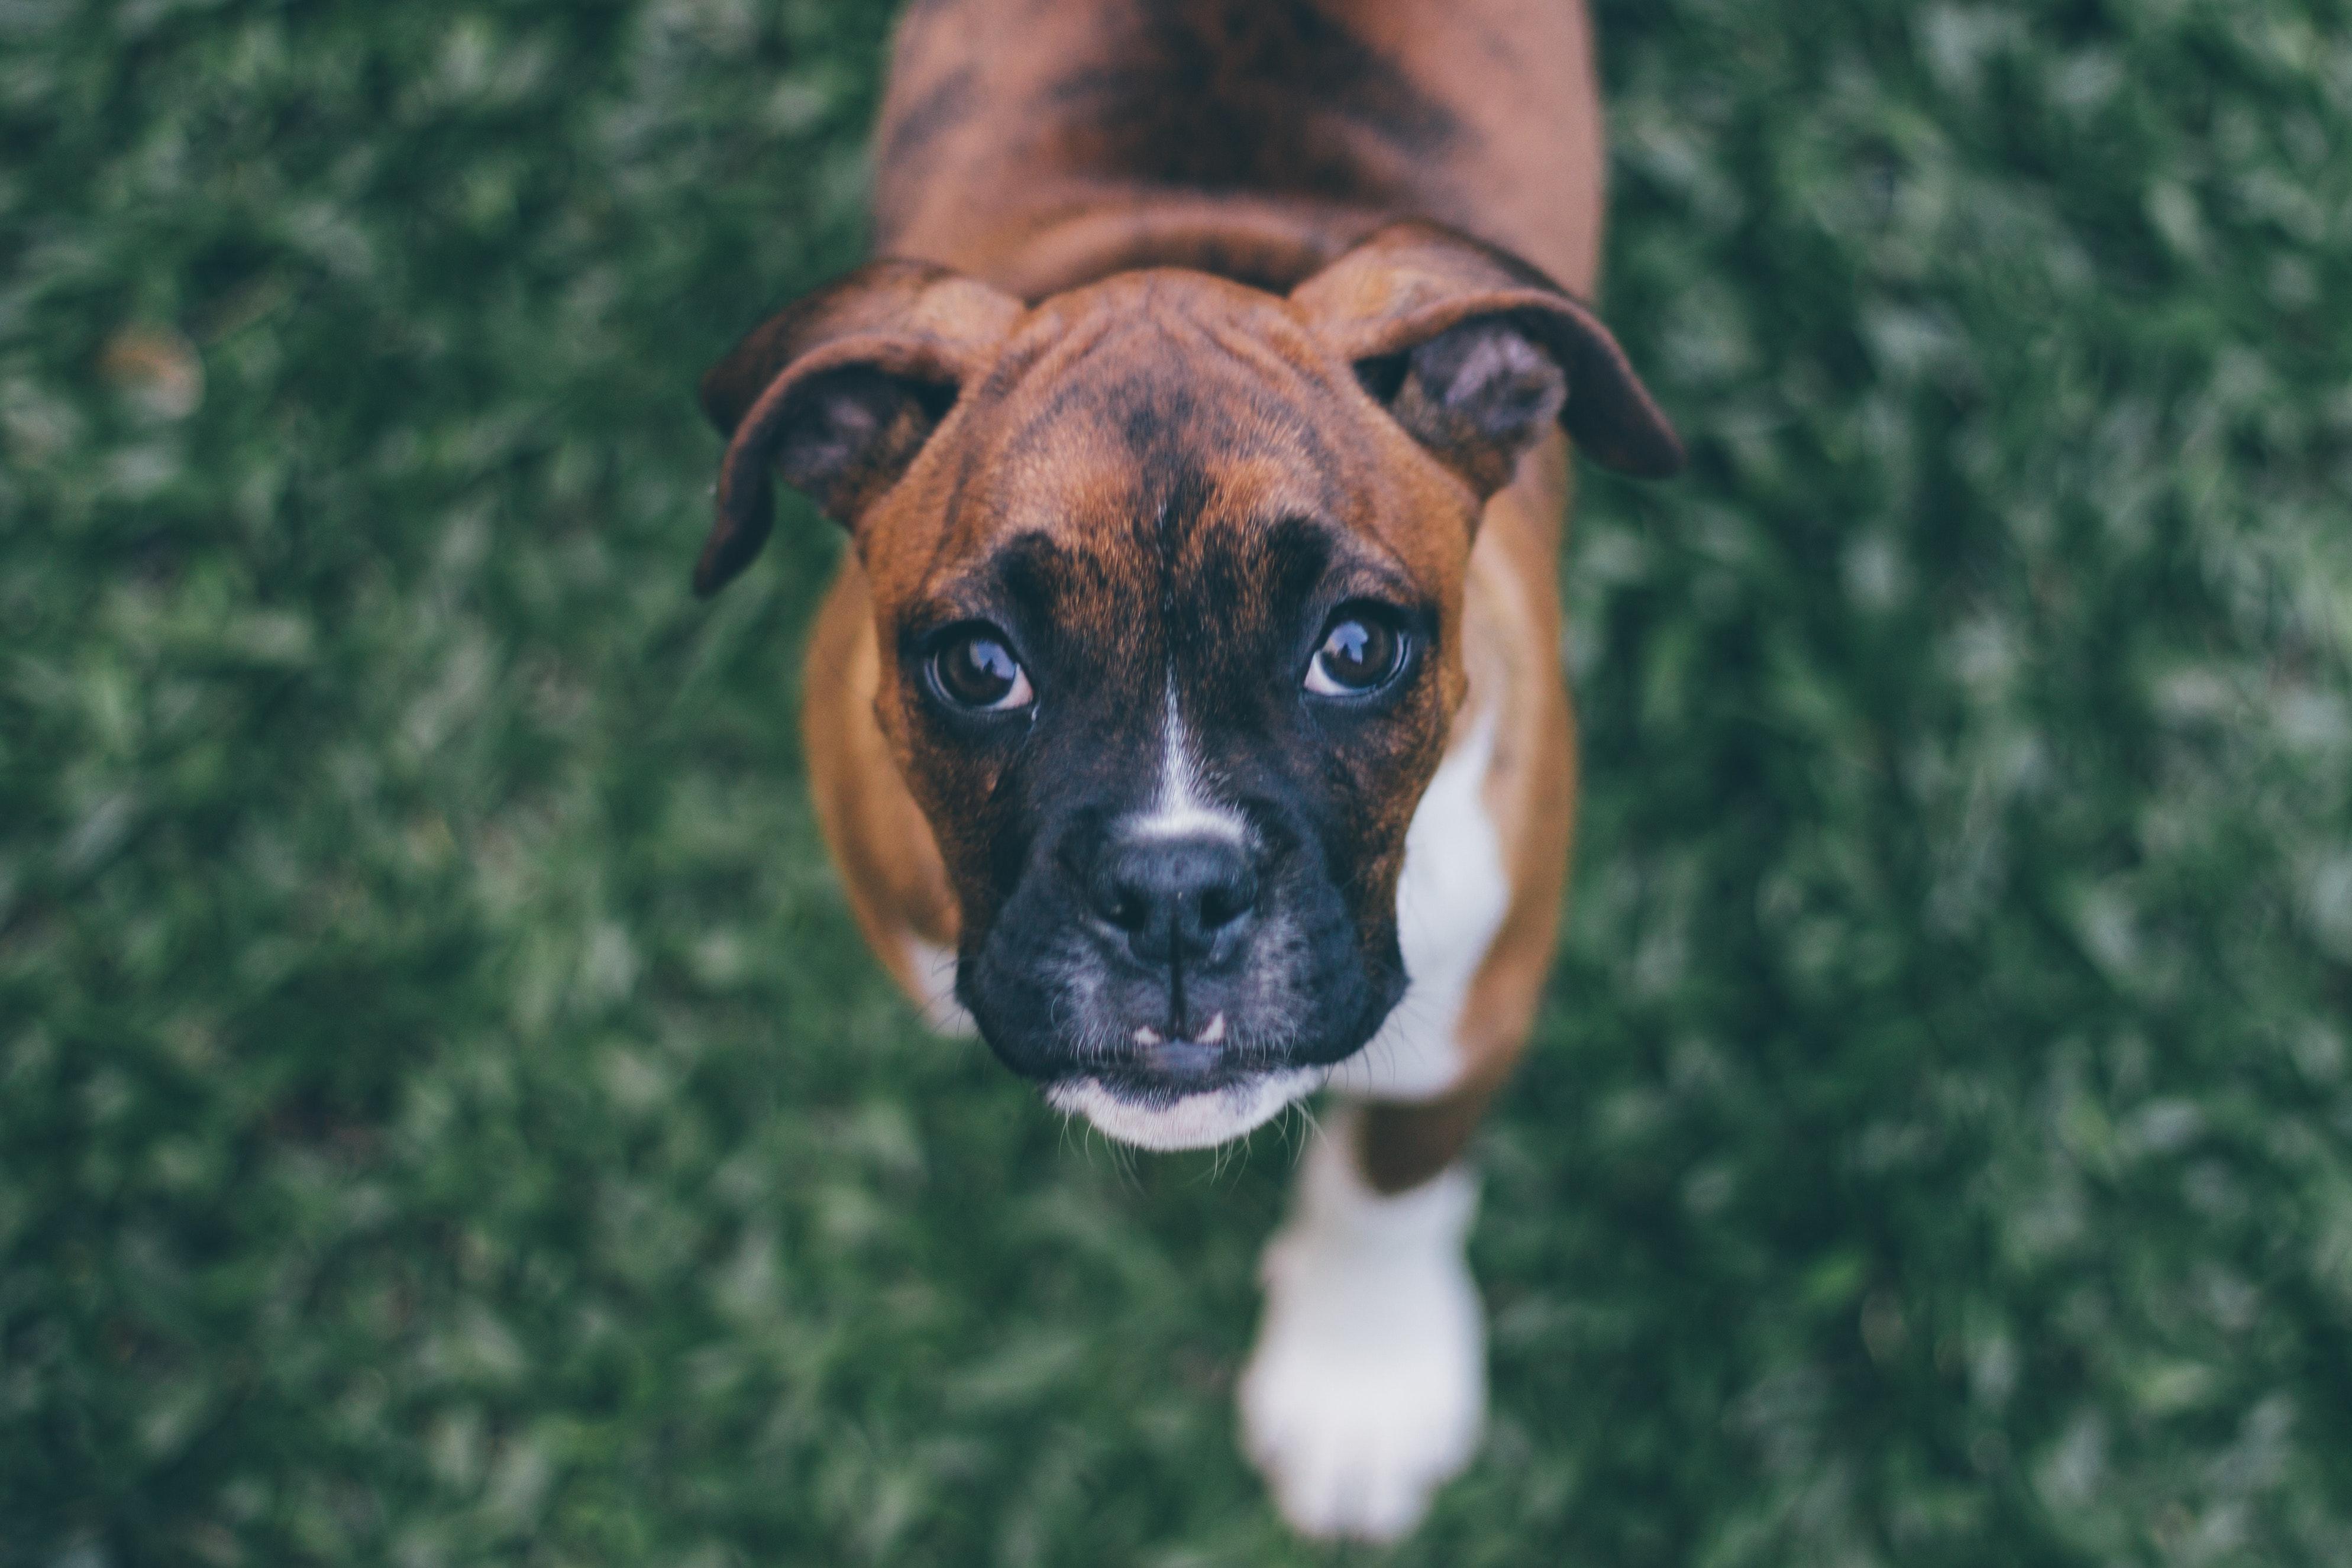 Free stock photos of baby dog · Pexels